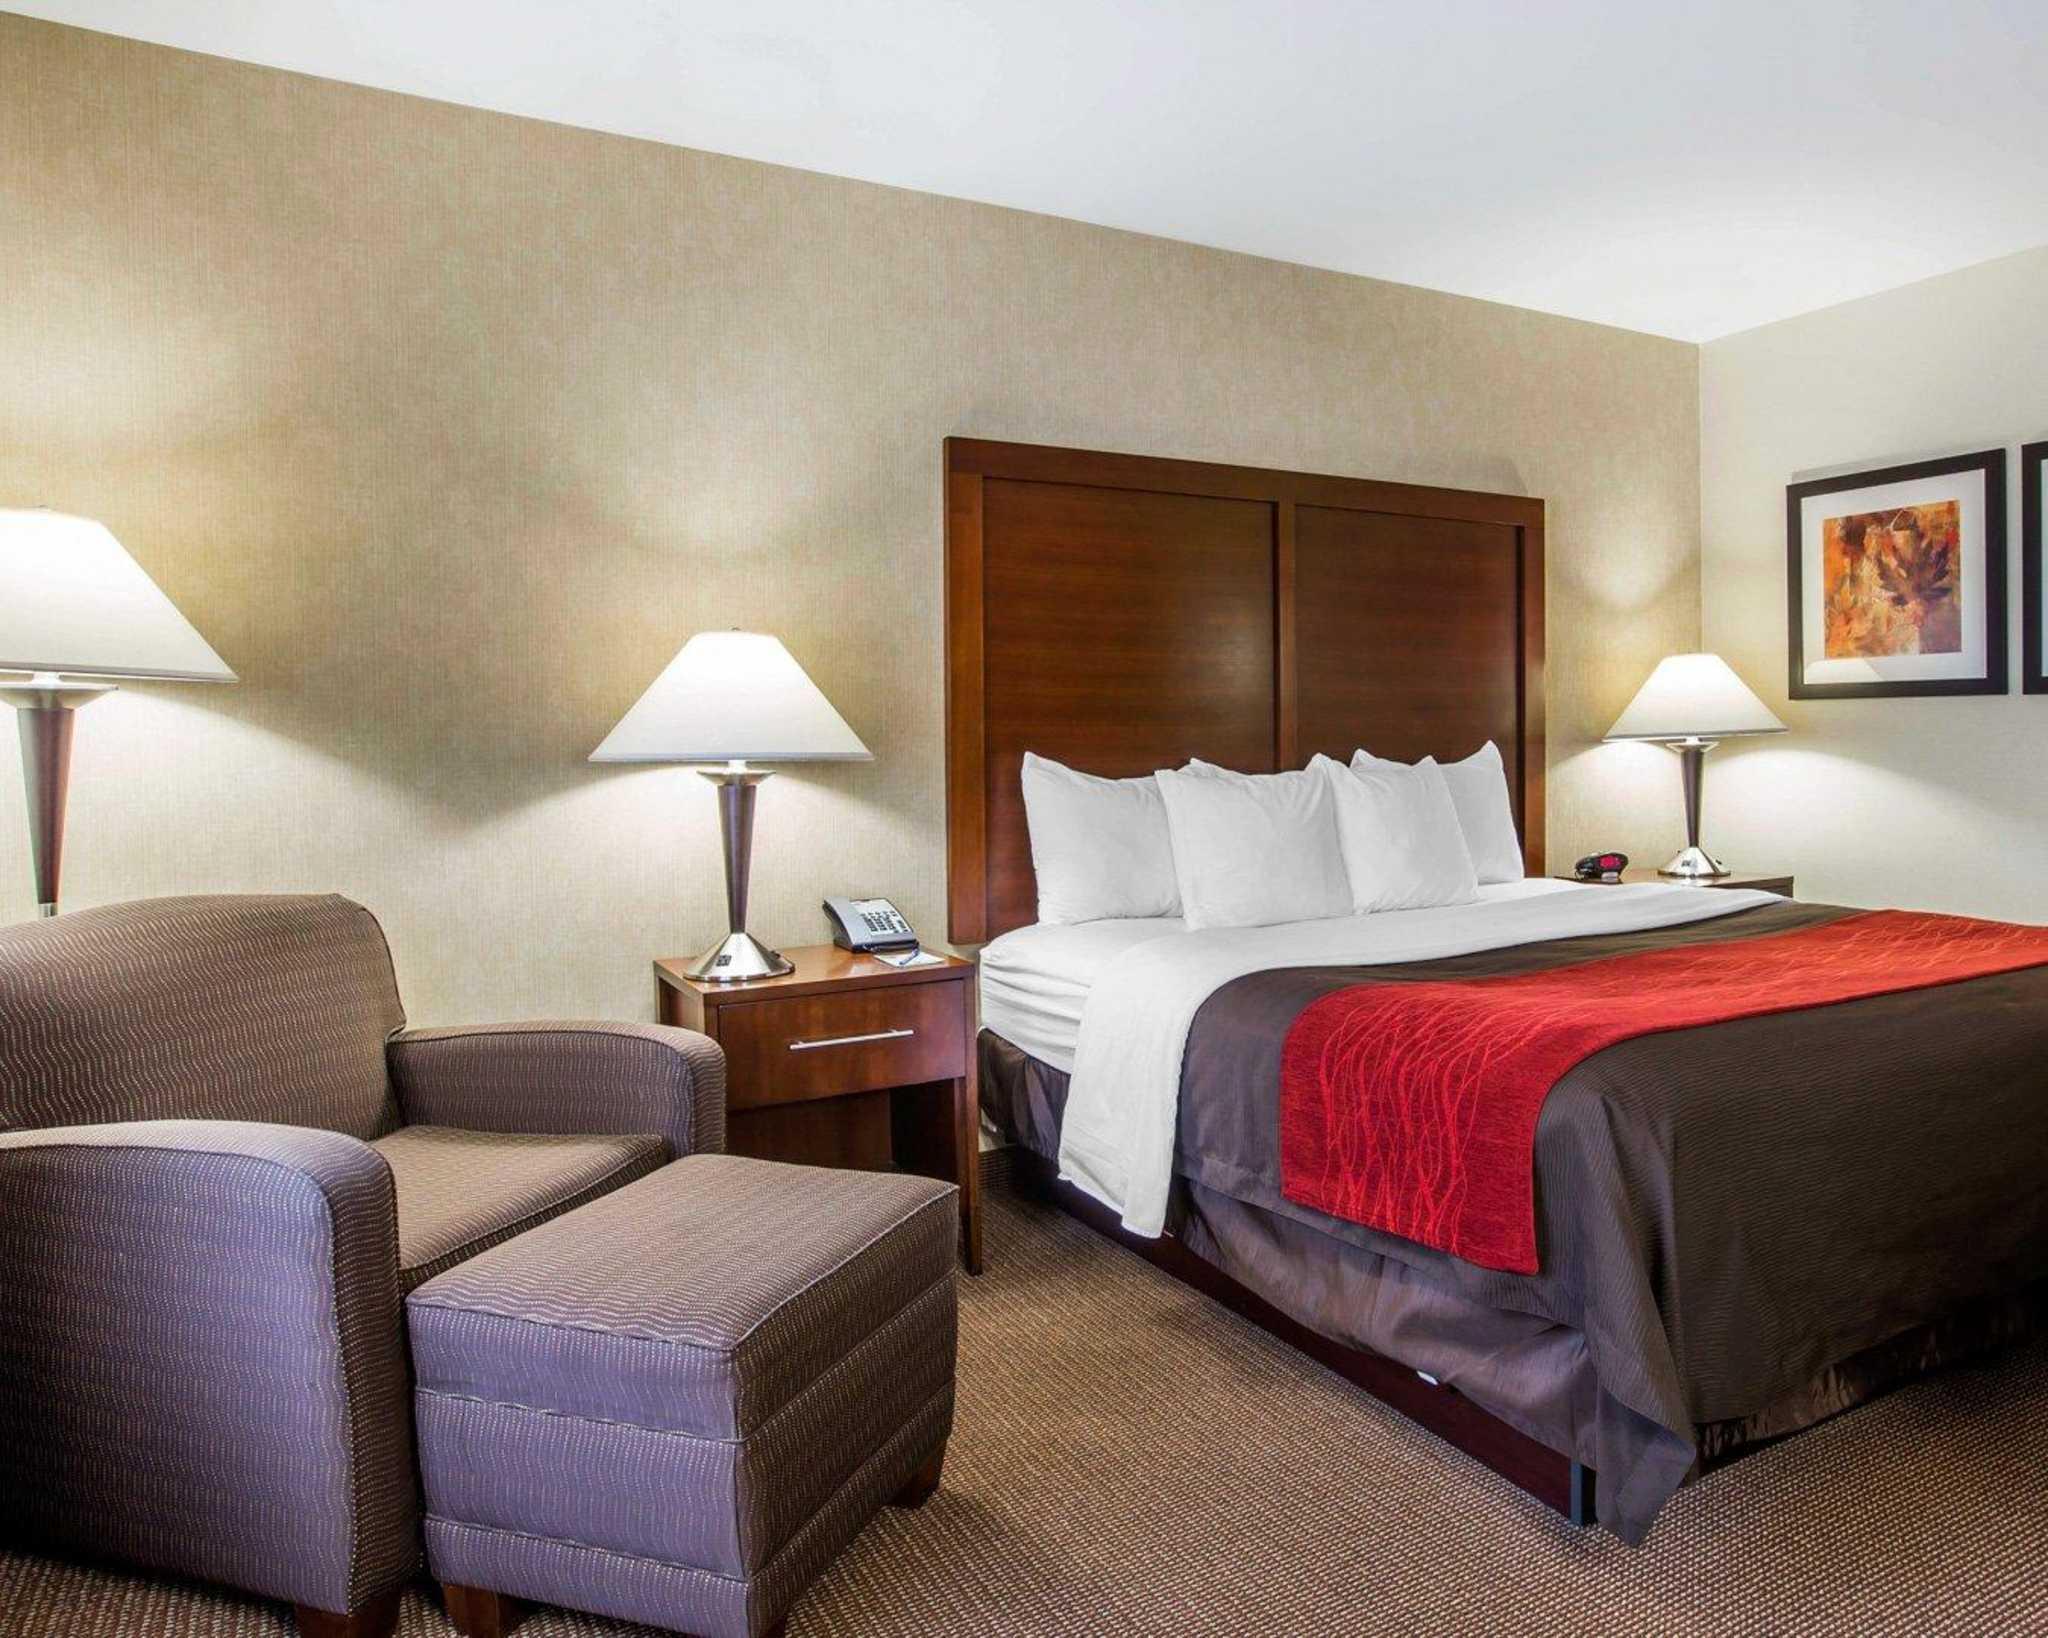 Comfort Inn & Suites adj to Akwesasne Mohawk Casino image 11